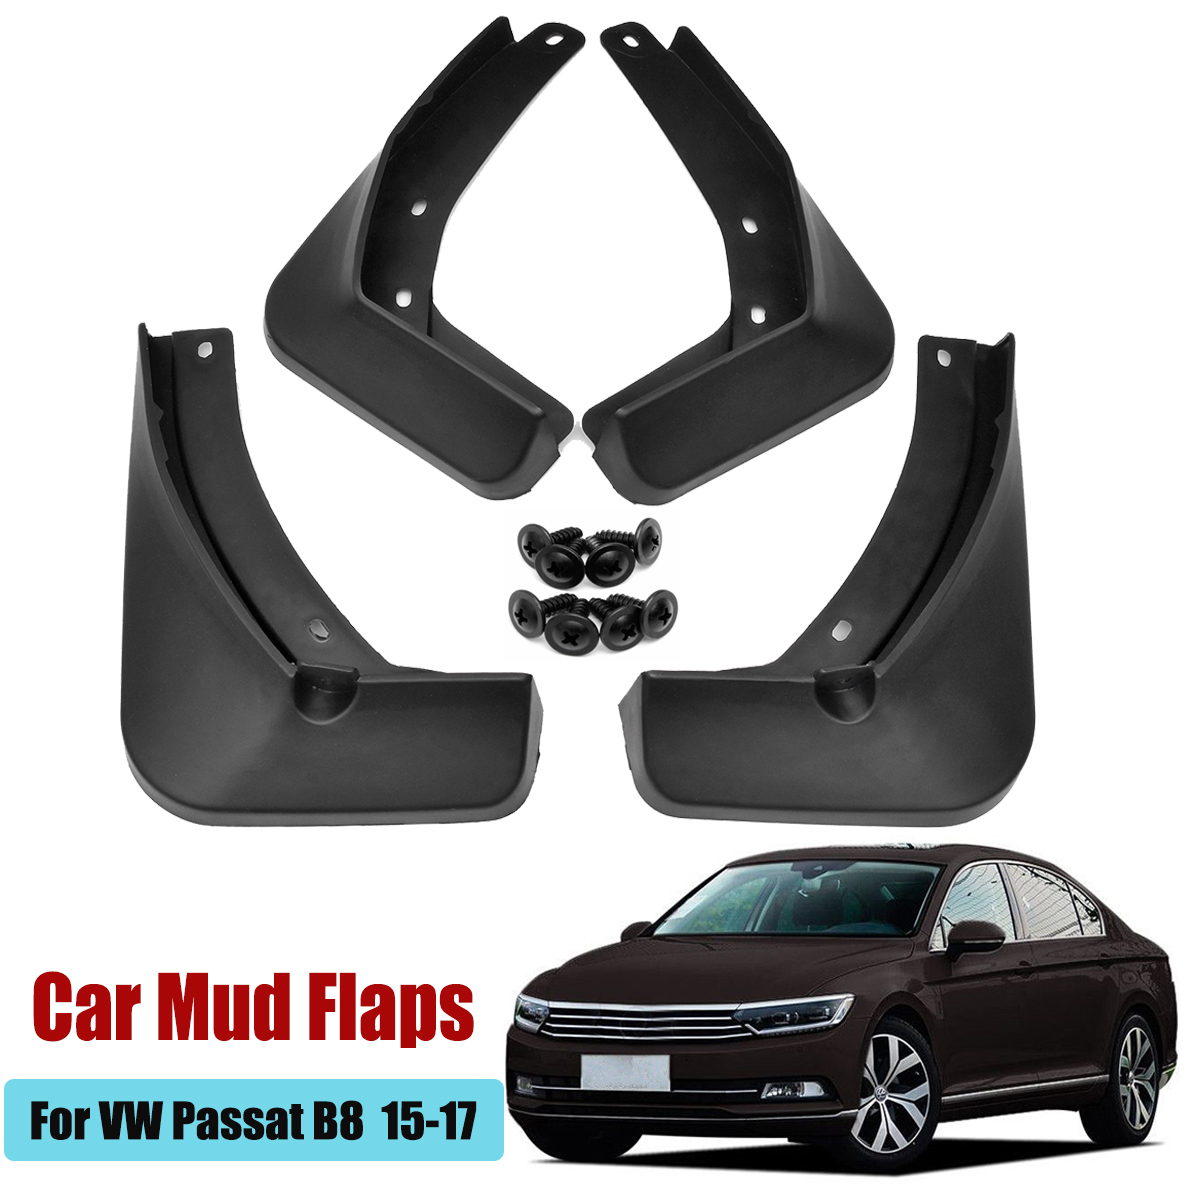 Guardabarros de coche guardabarros Splash guardias guardabarros accesorios de guardabarros para VW Passat B8 2015, 2016, 2017, 2018, 2019